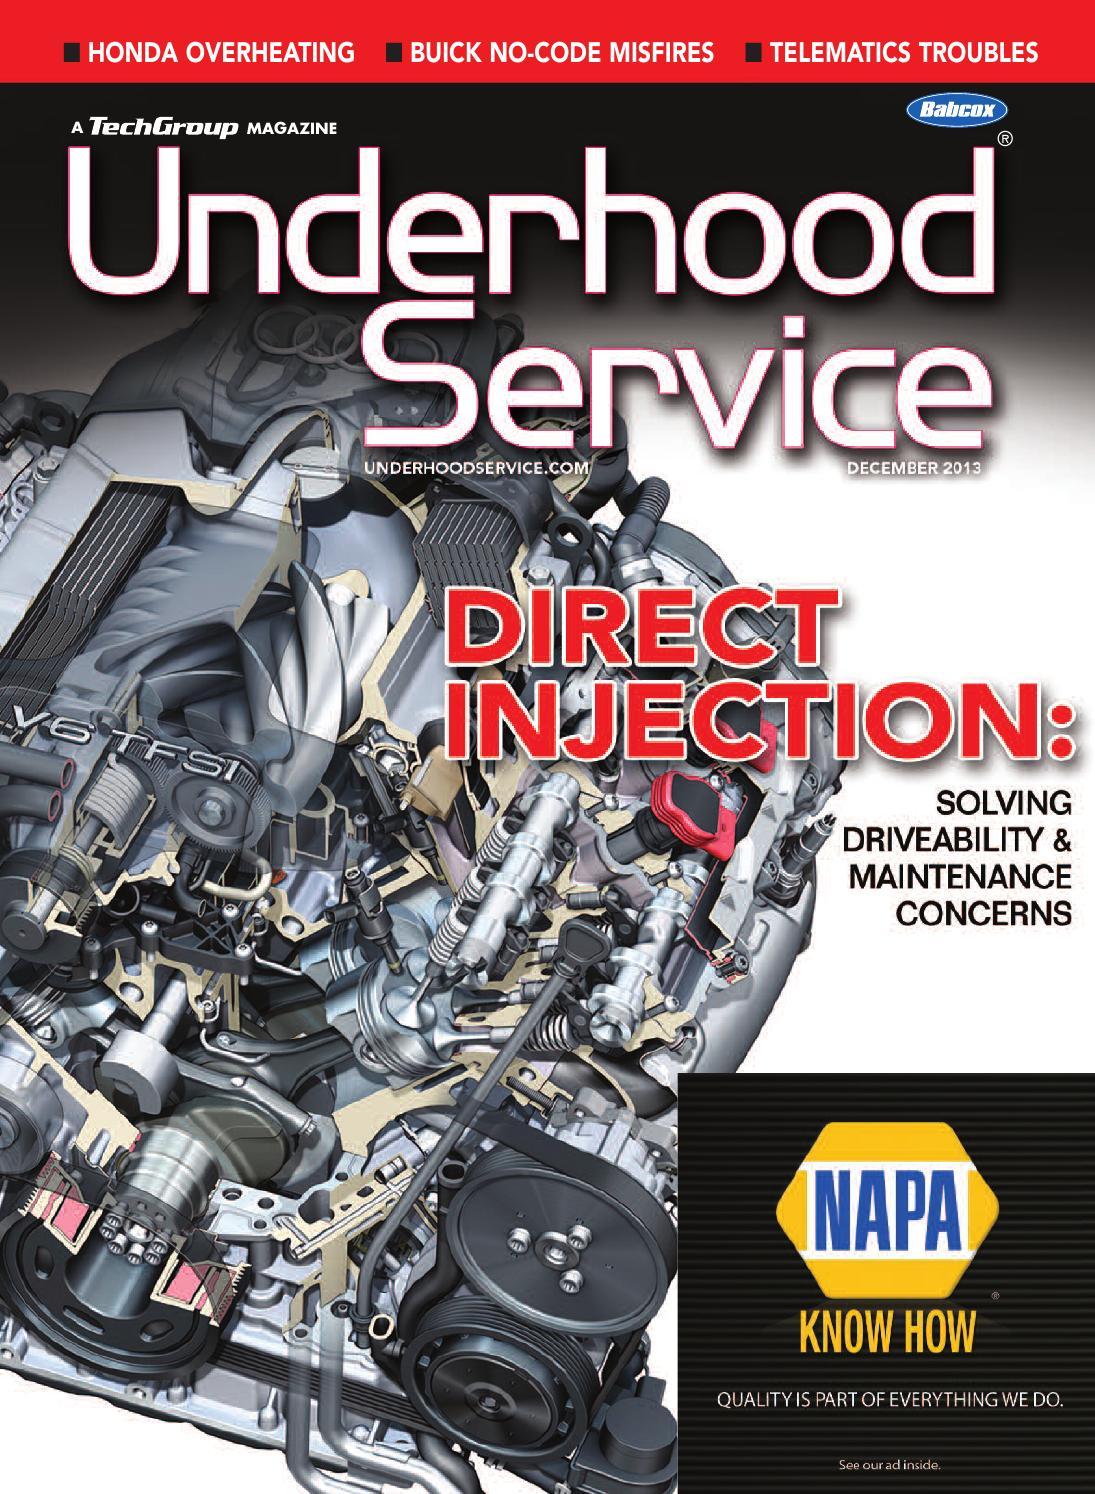 Underhood Service, December 2013 by Babcox Media - Issuu